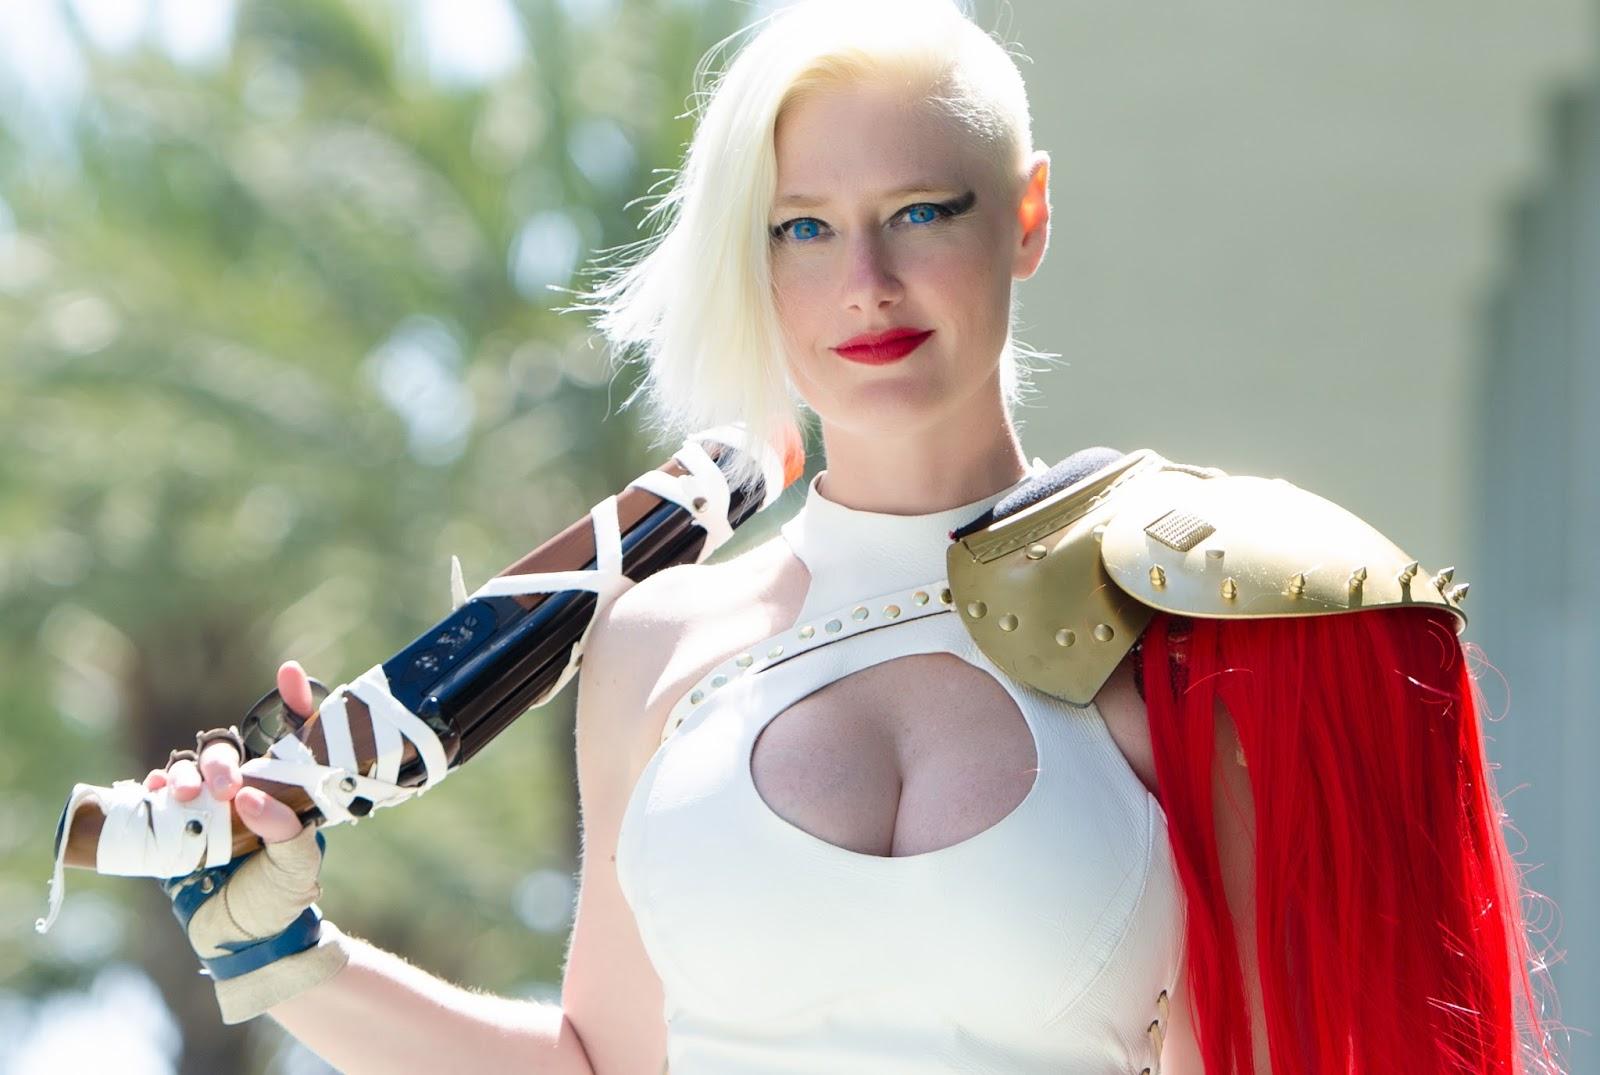 Vegas PG - Power Girl | V Threepio | Flickr